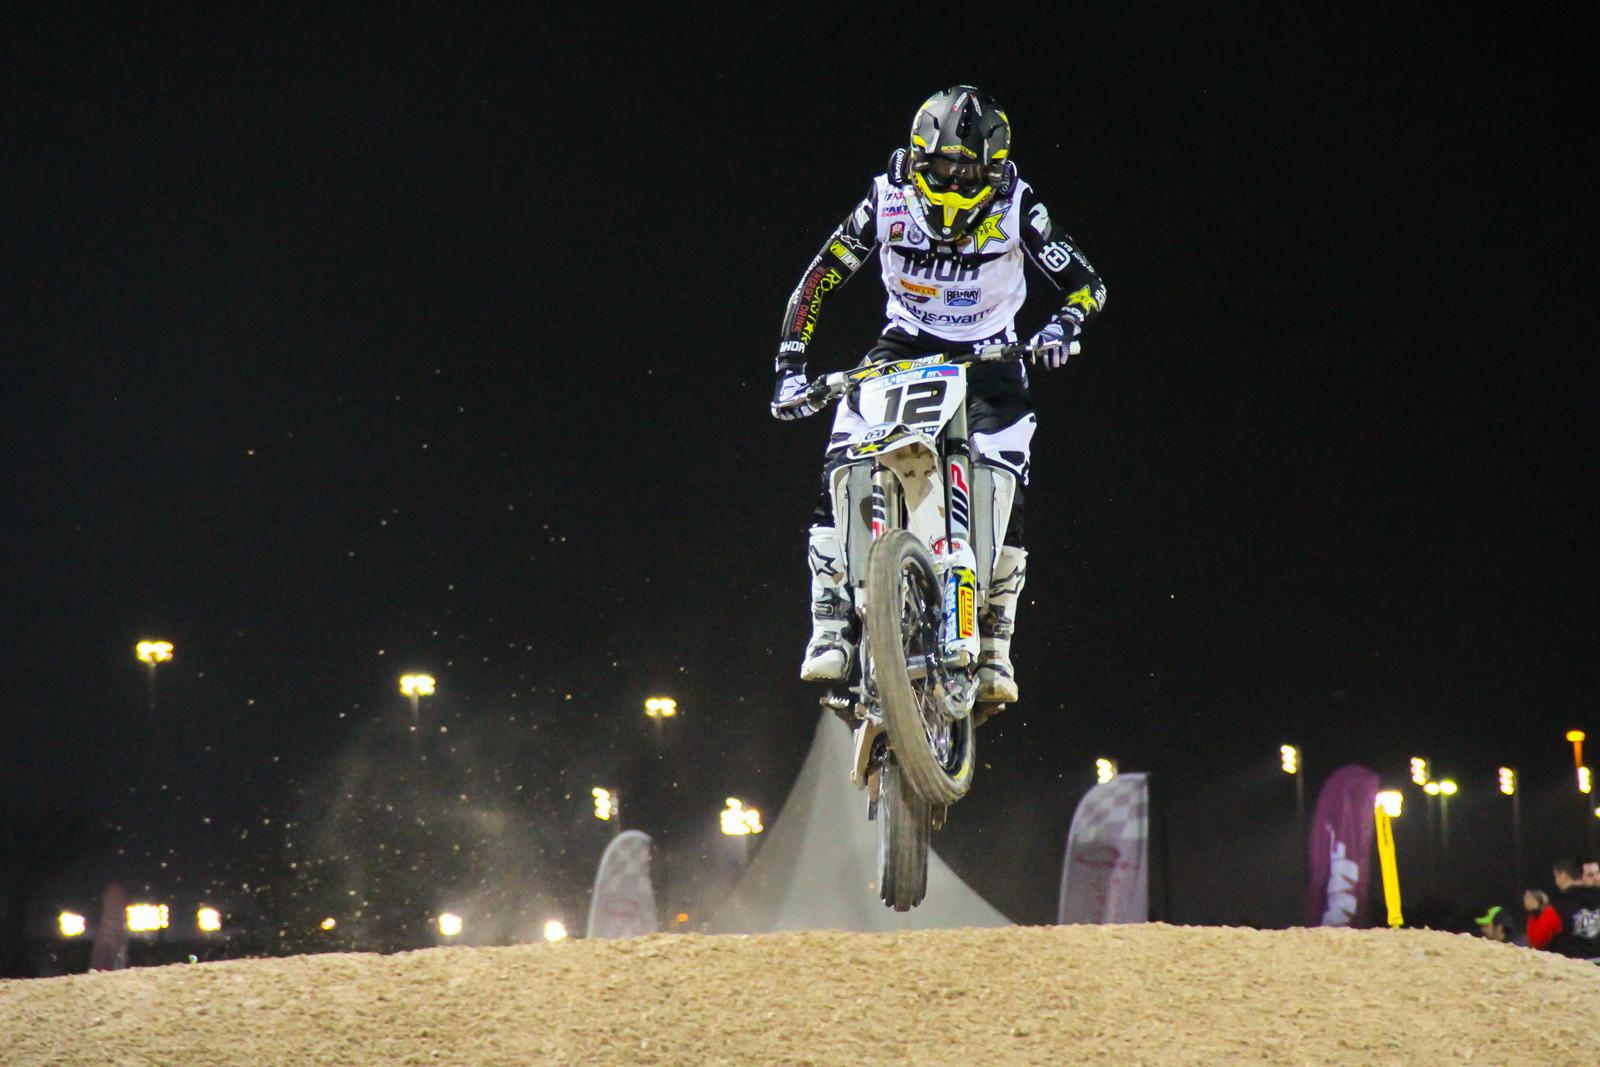 Max Nagl - Photo Blast: 2017 MXGP of Qatar - Motocross Pictures - Vital MX